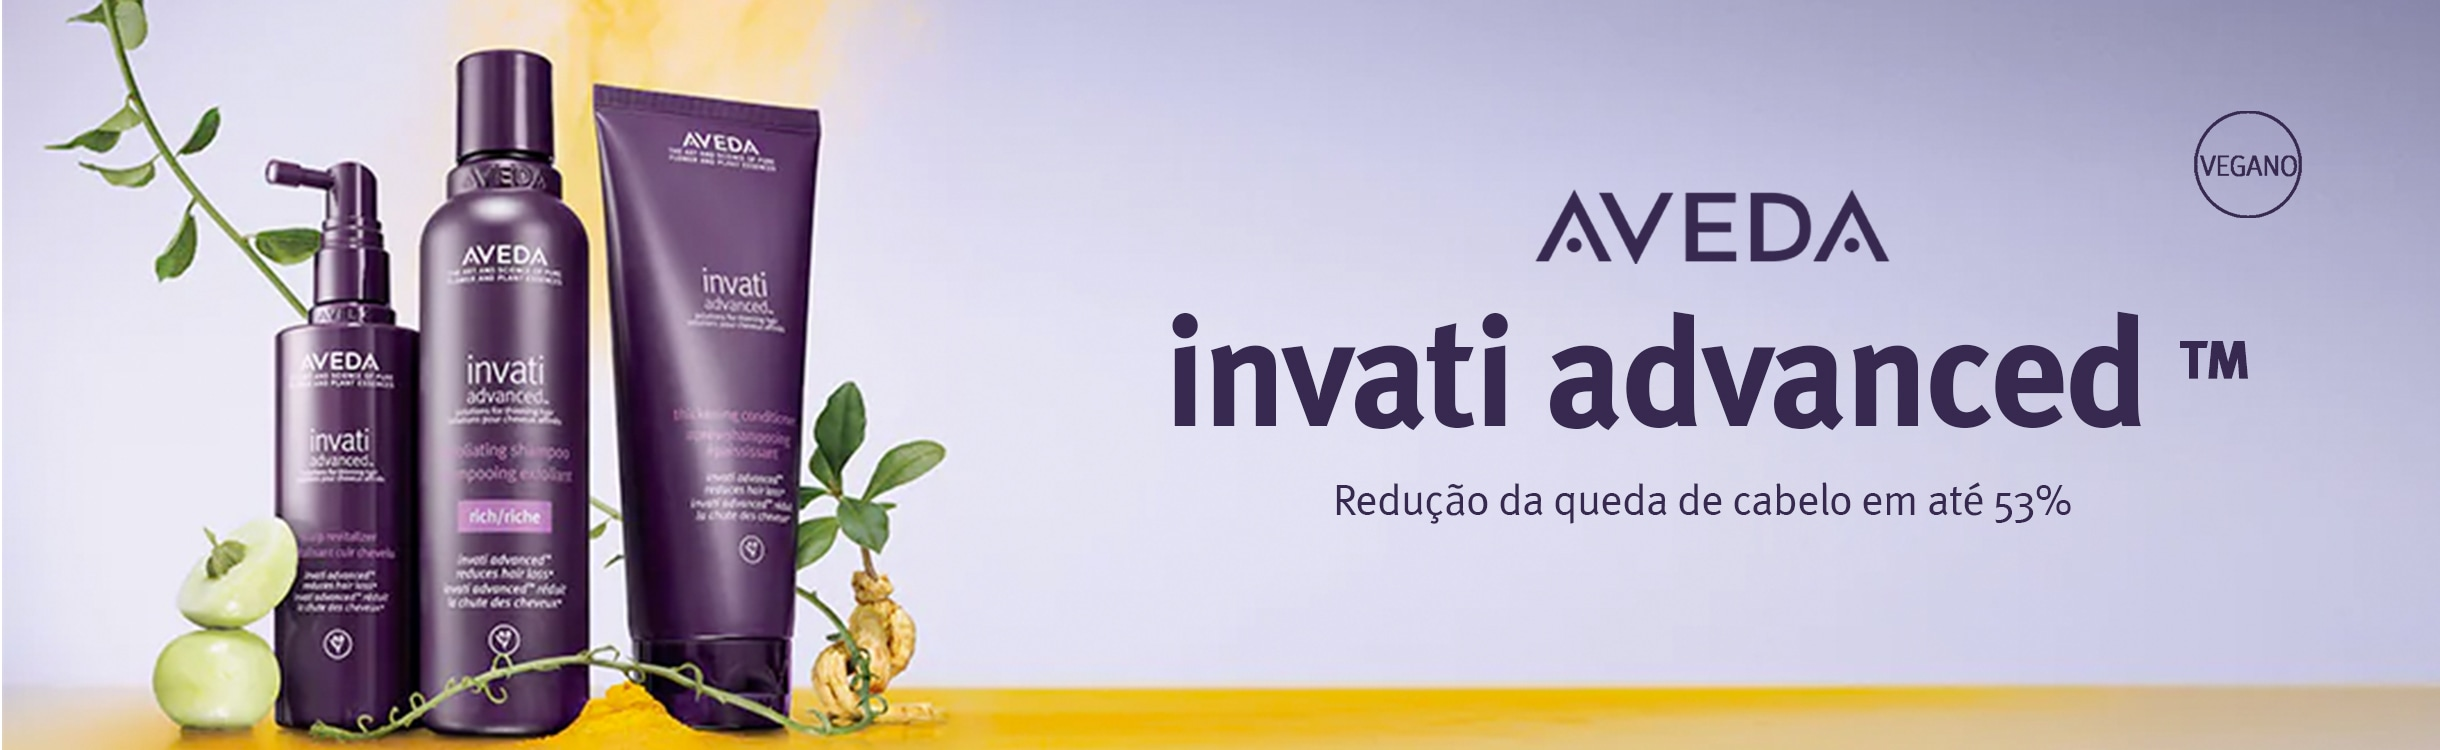 Aveda Invati Advanced